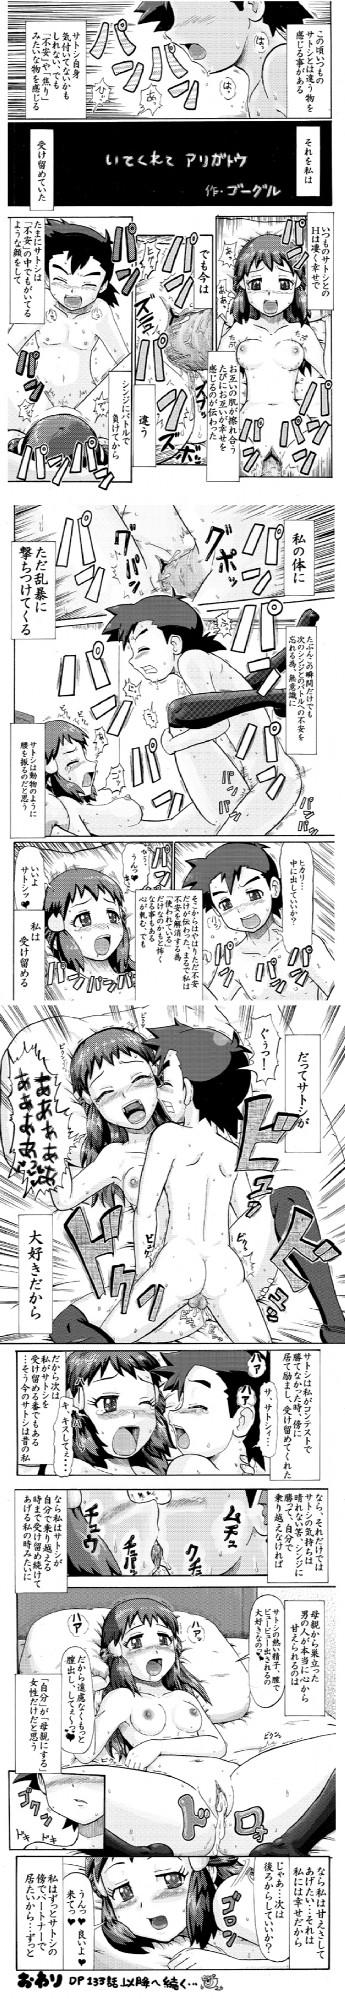 human female fanfiction male x pokemon lemon Hitomi tanaka covered in cum